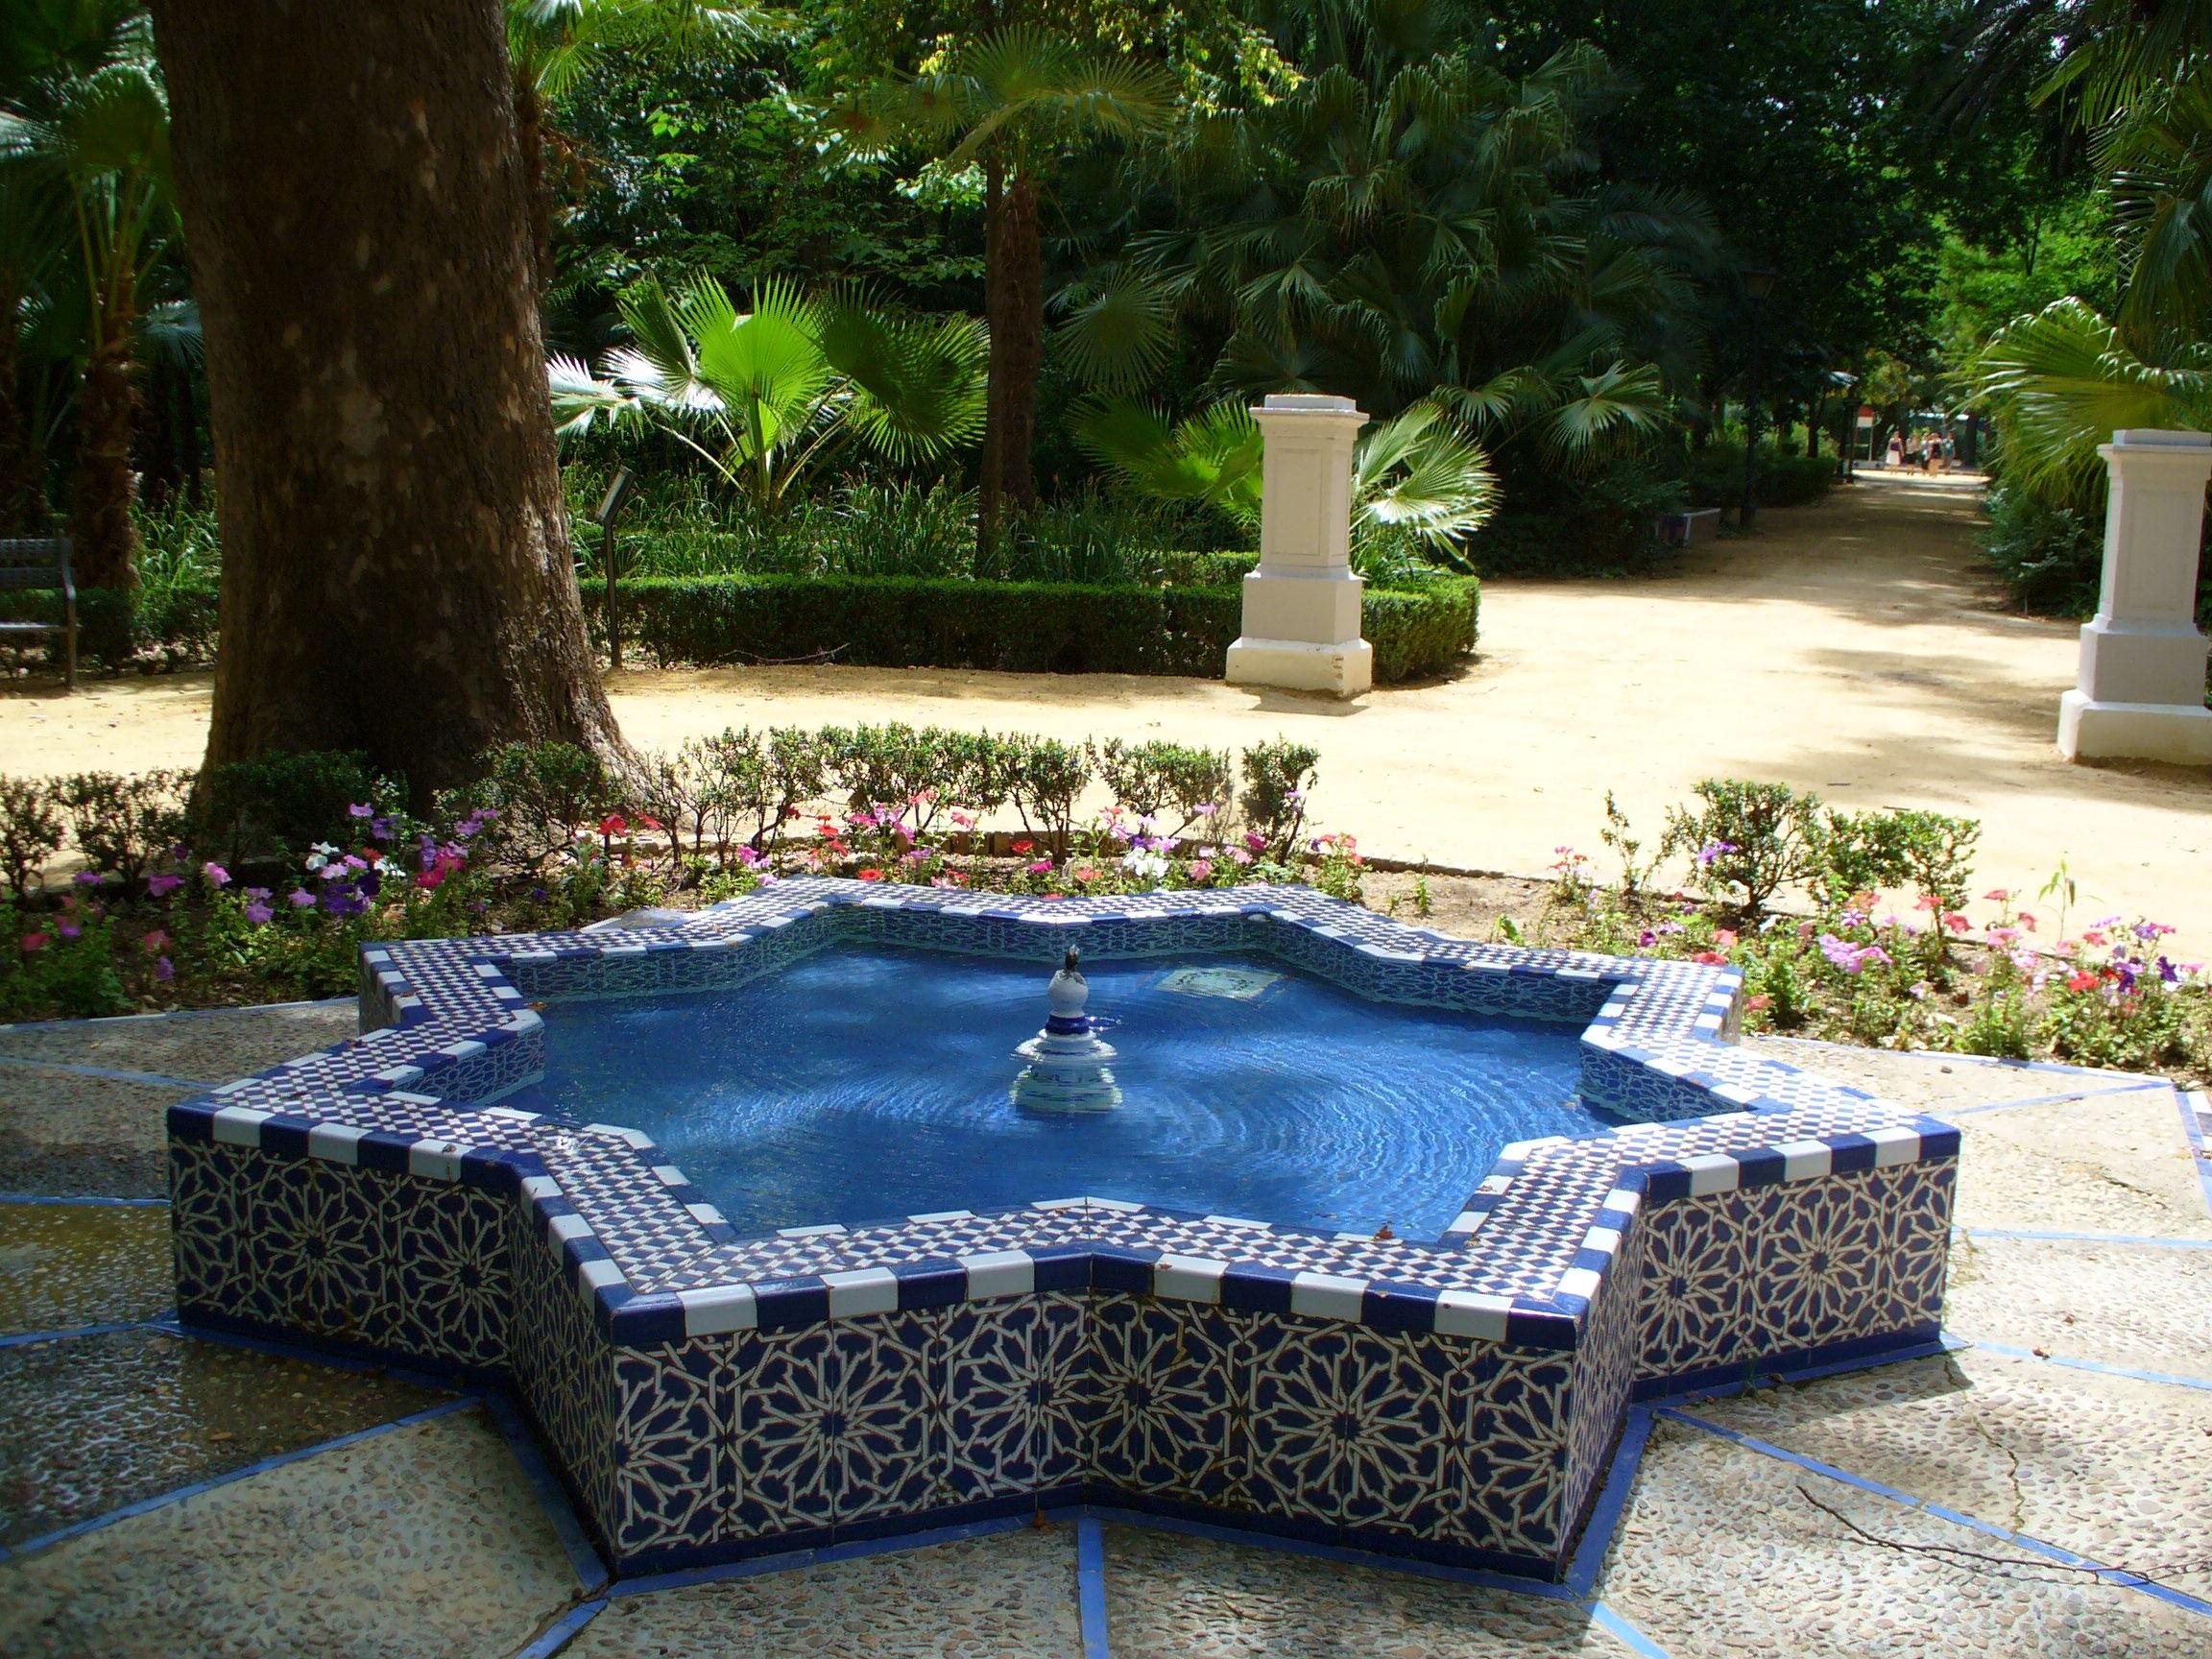 Fotos gratis mesa c sped estanque piscina parque for Paisajismo para piscinas